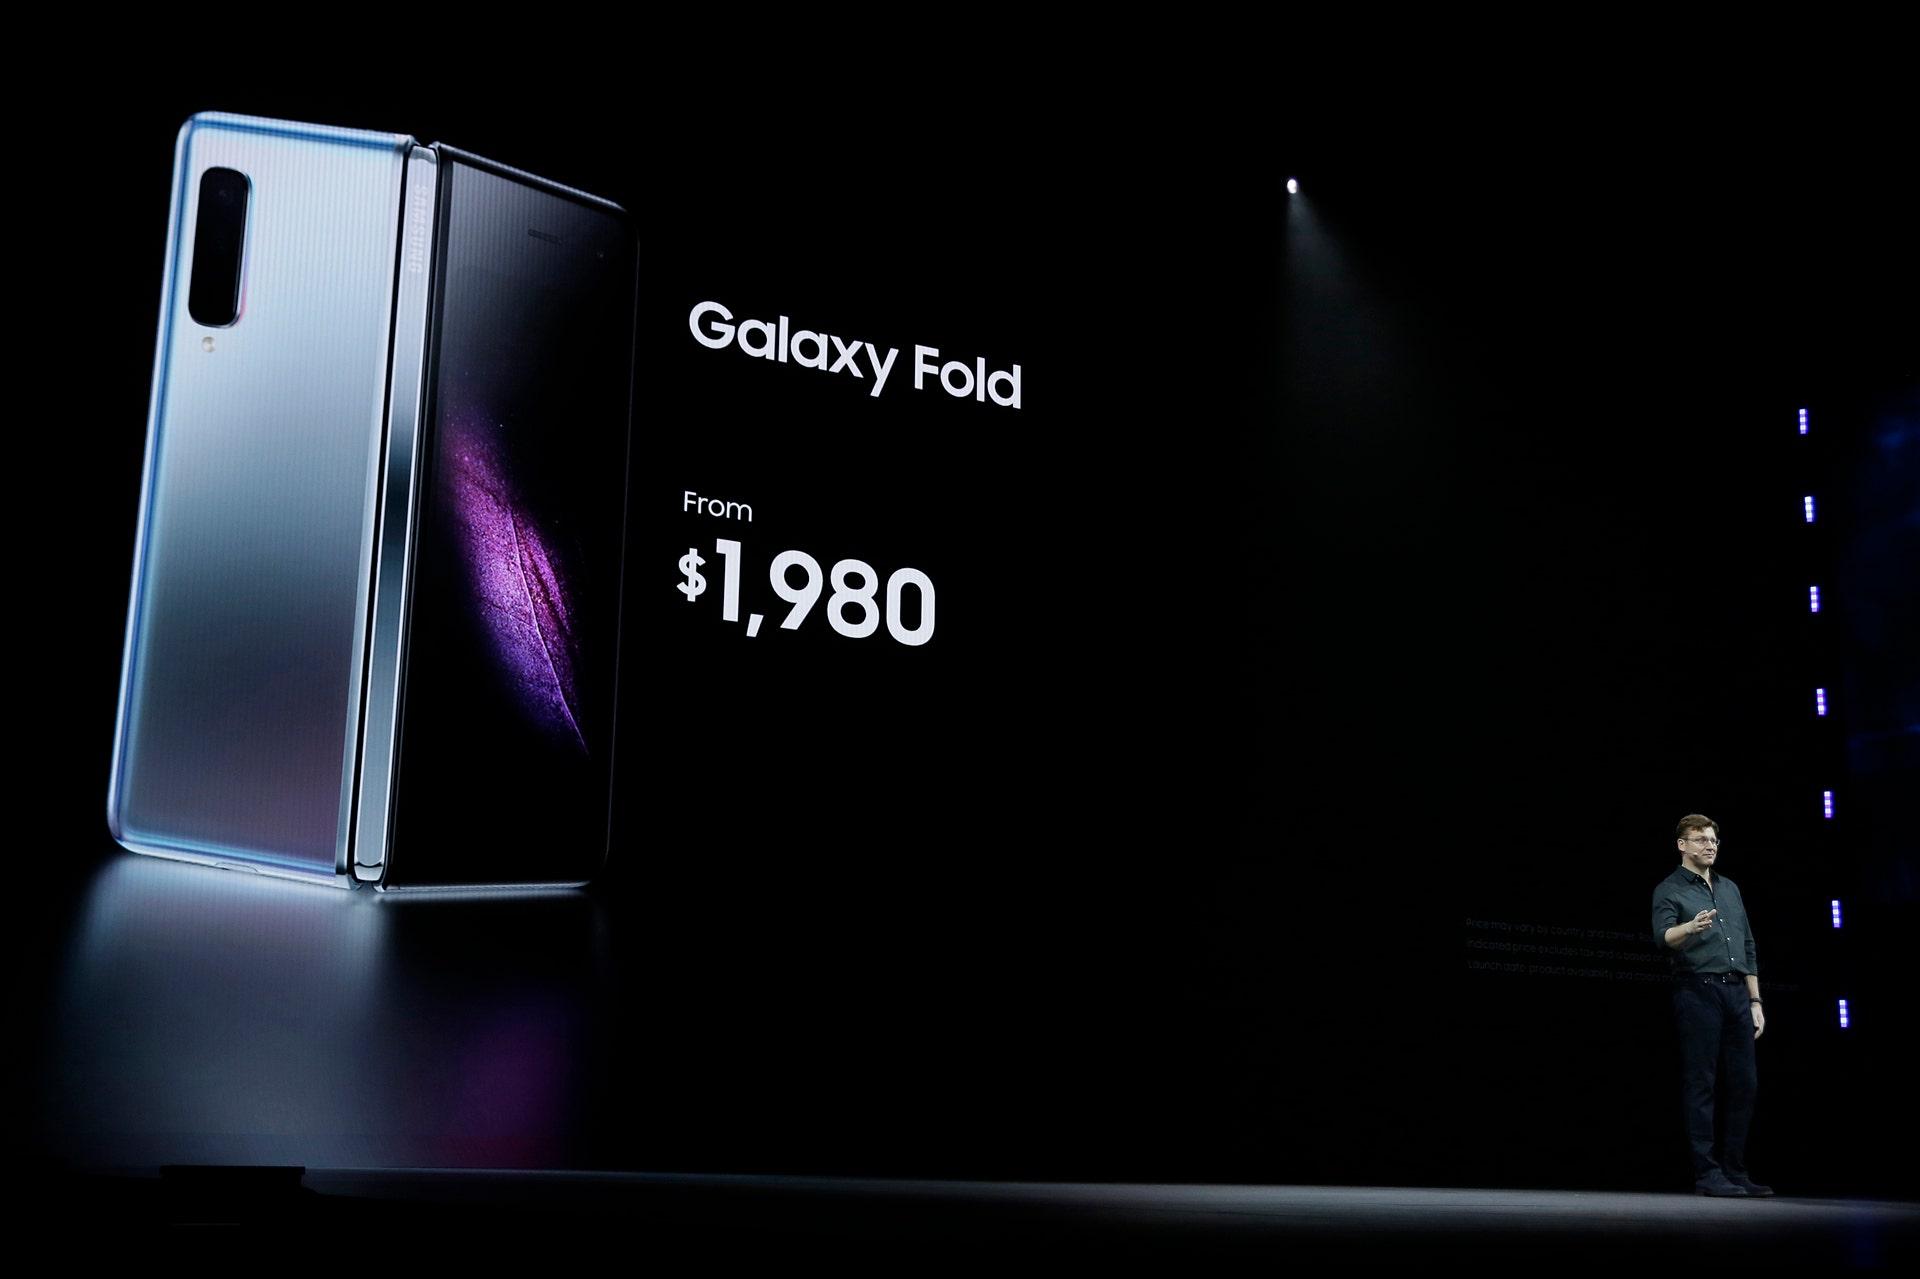 Samsung Galaxy Fold smartphone starts at $2G's